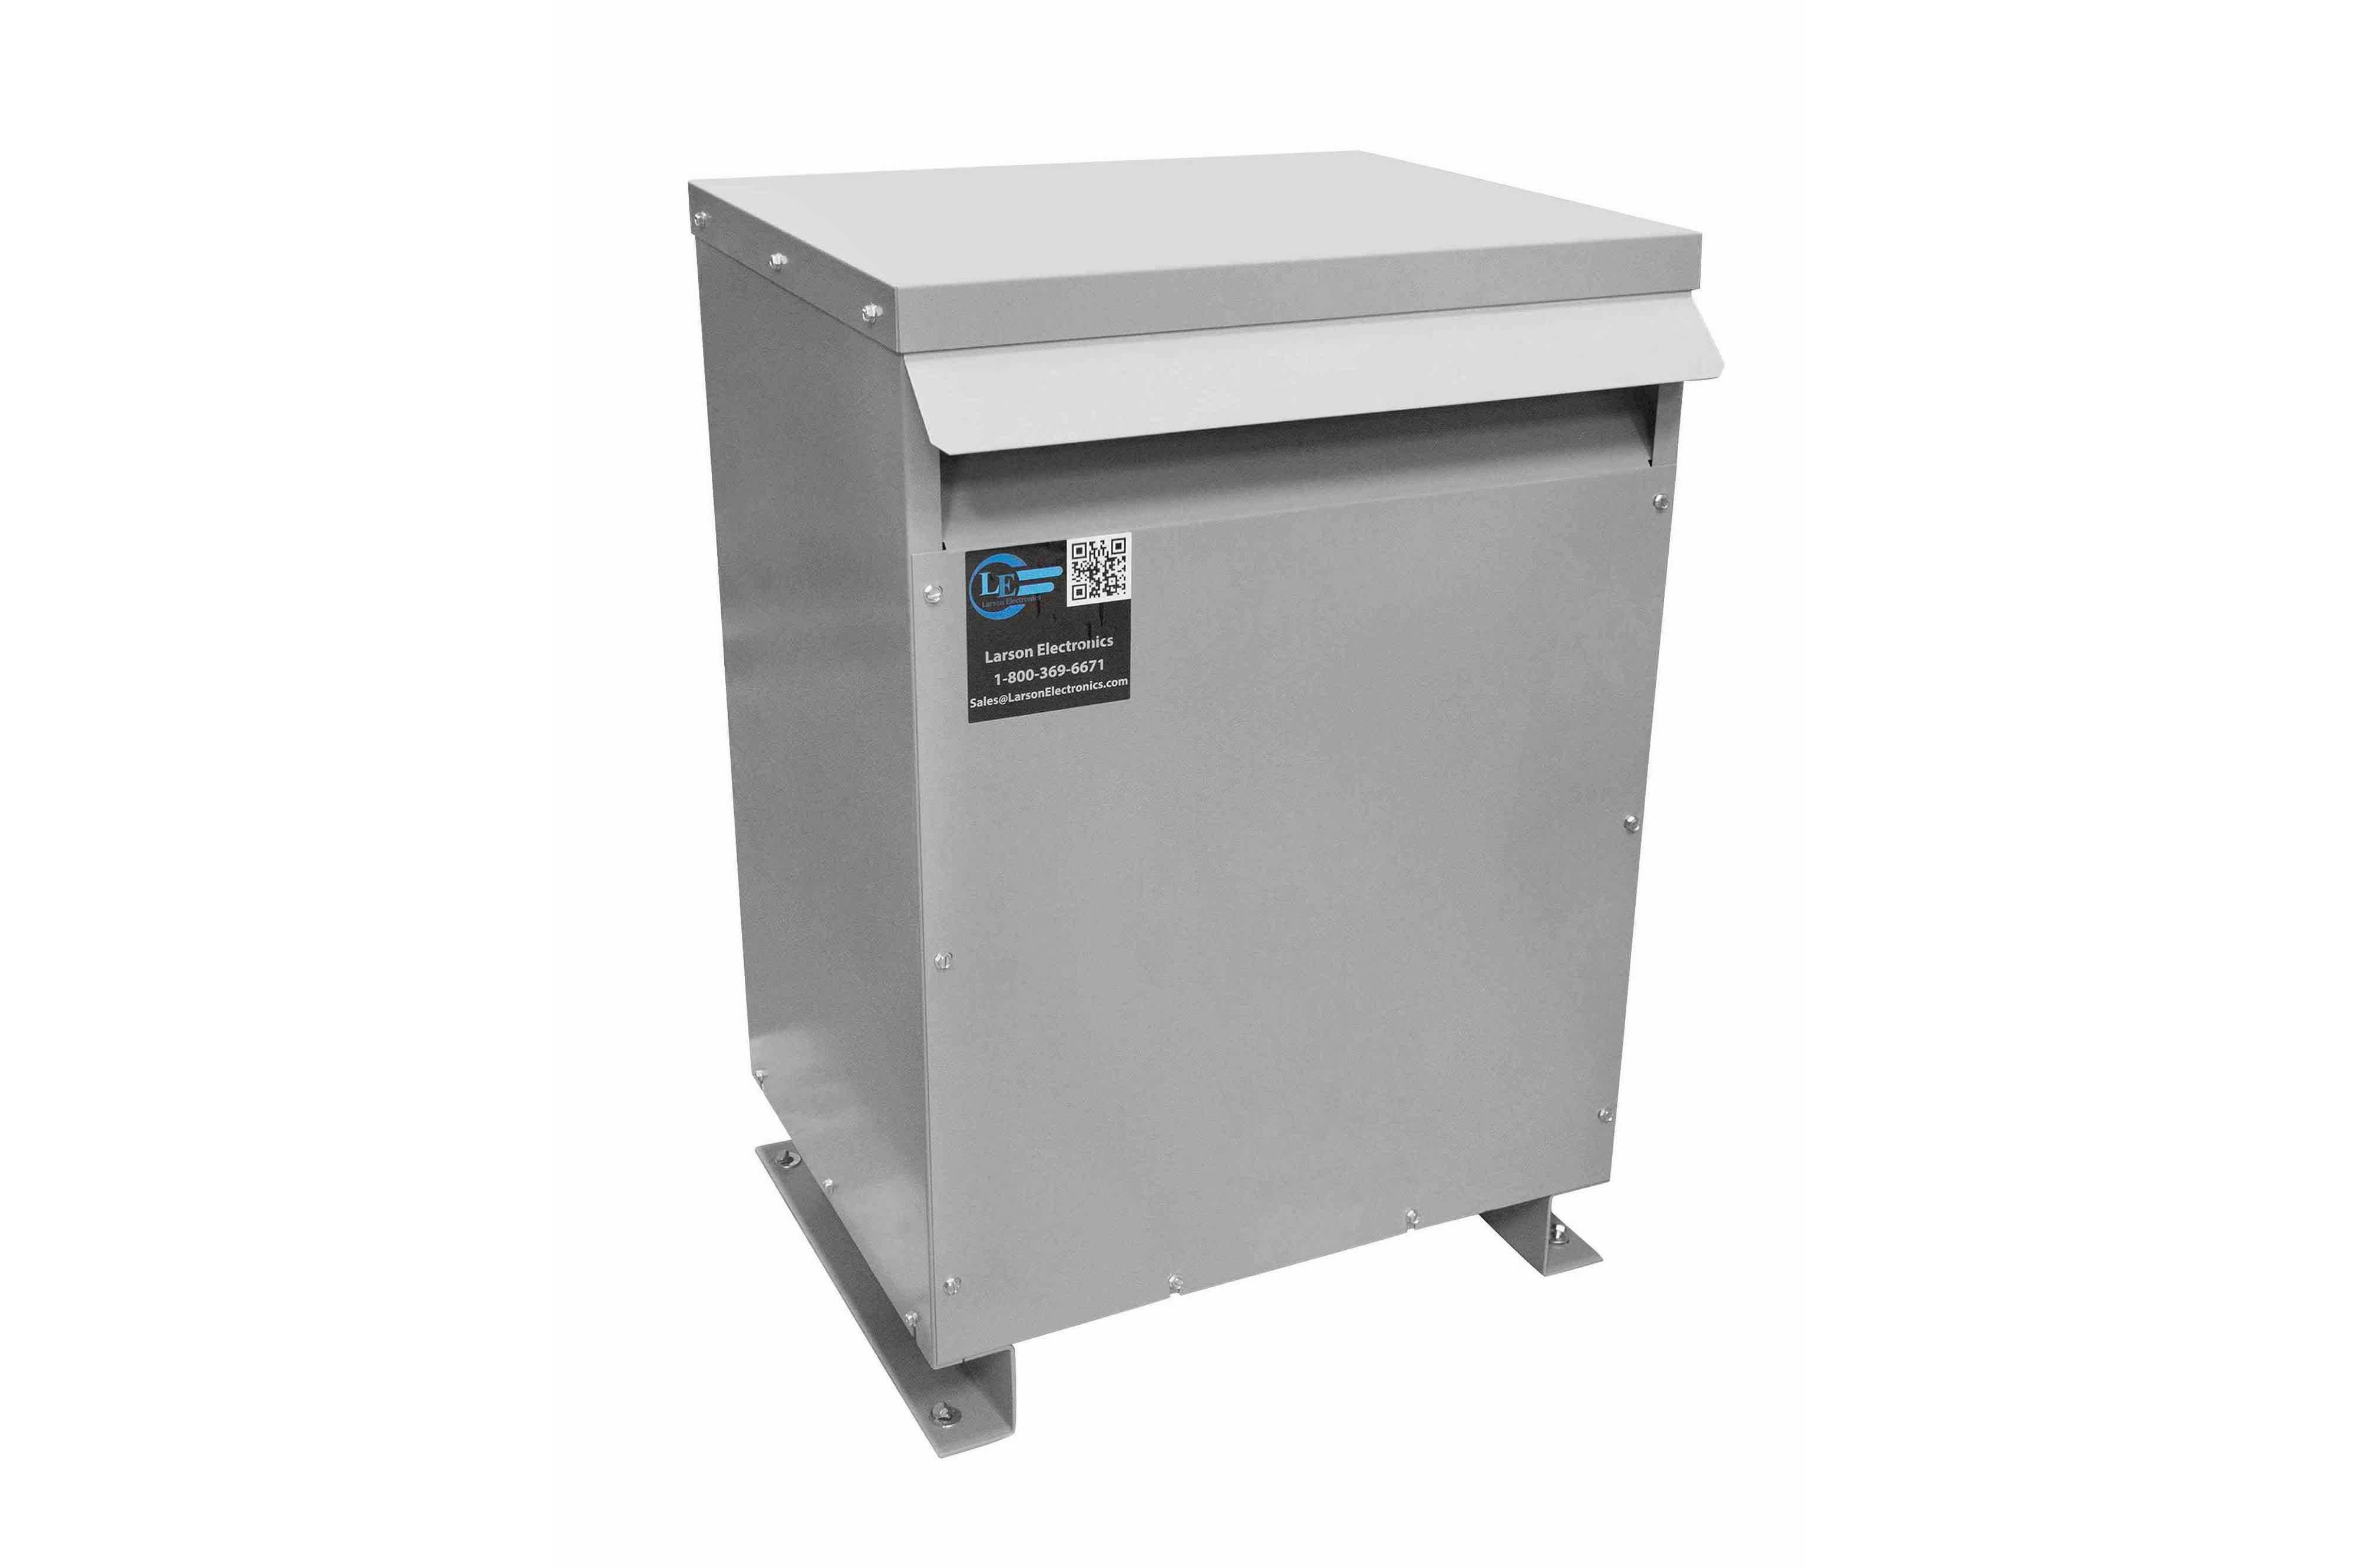 750 kVA 3PH Isolation Transformer, 400V Wye Primary, 600V Delta Secondary, N3R, Ventilated, 60 Hz